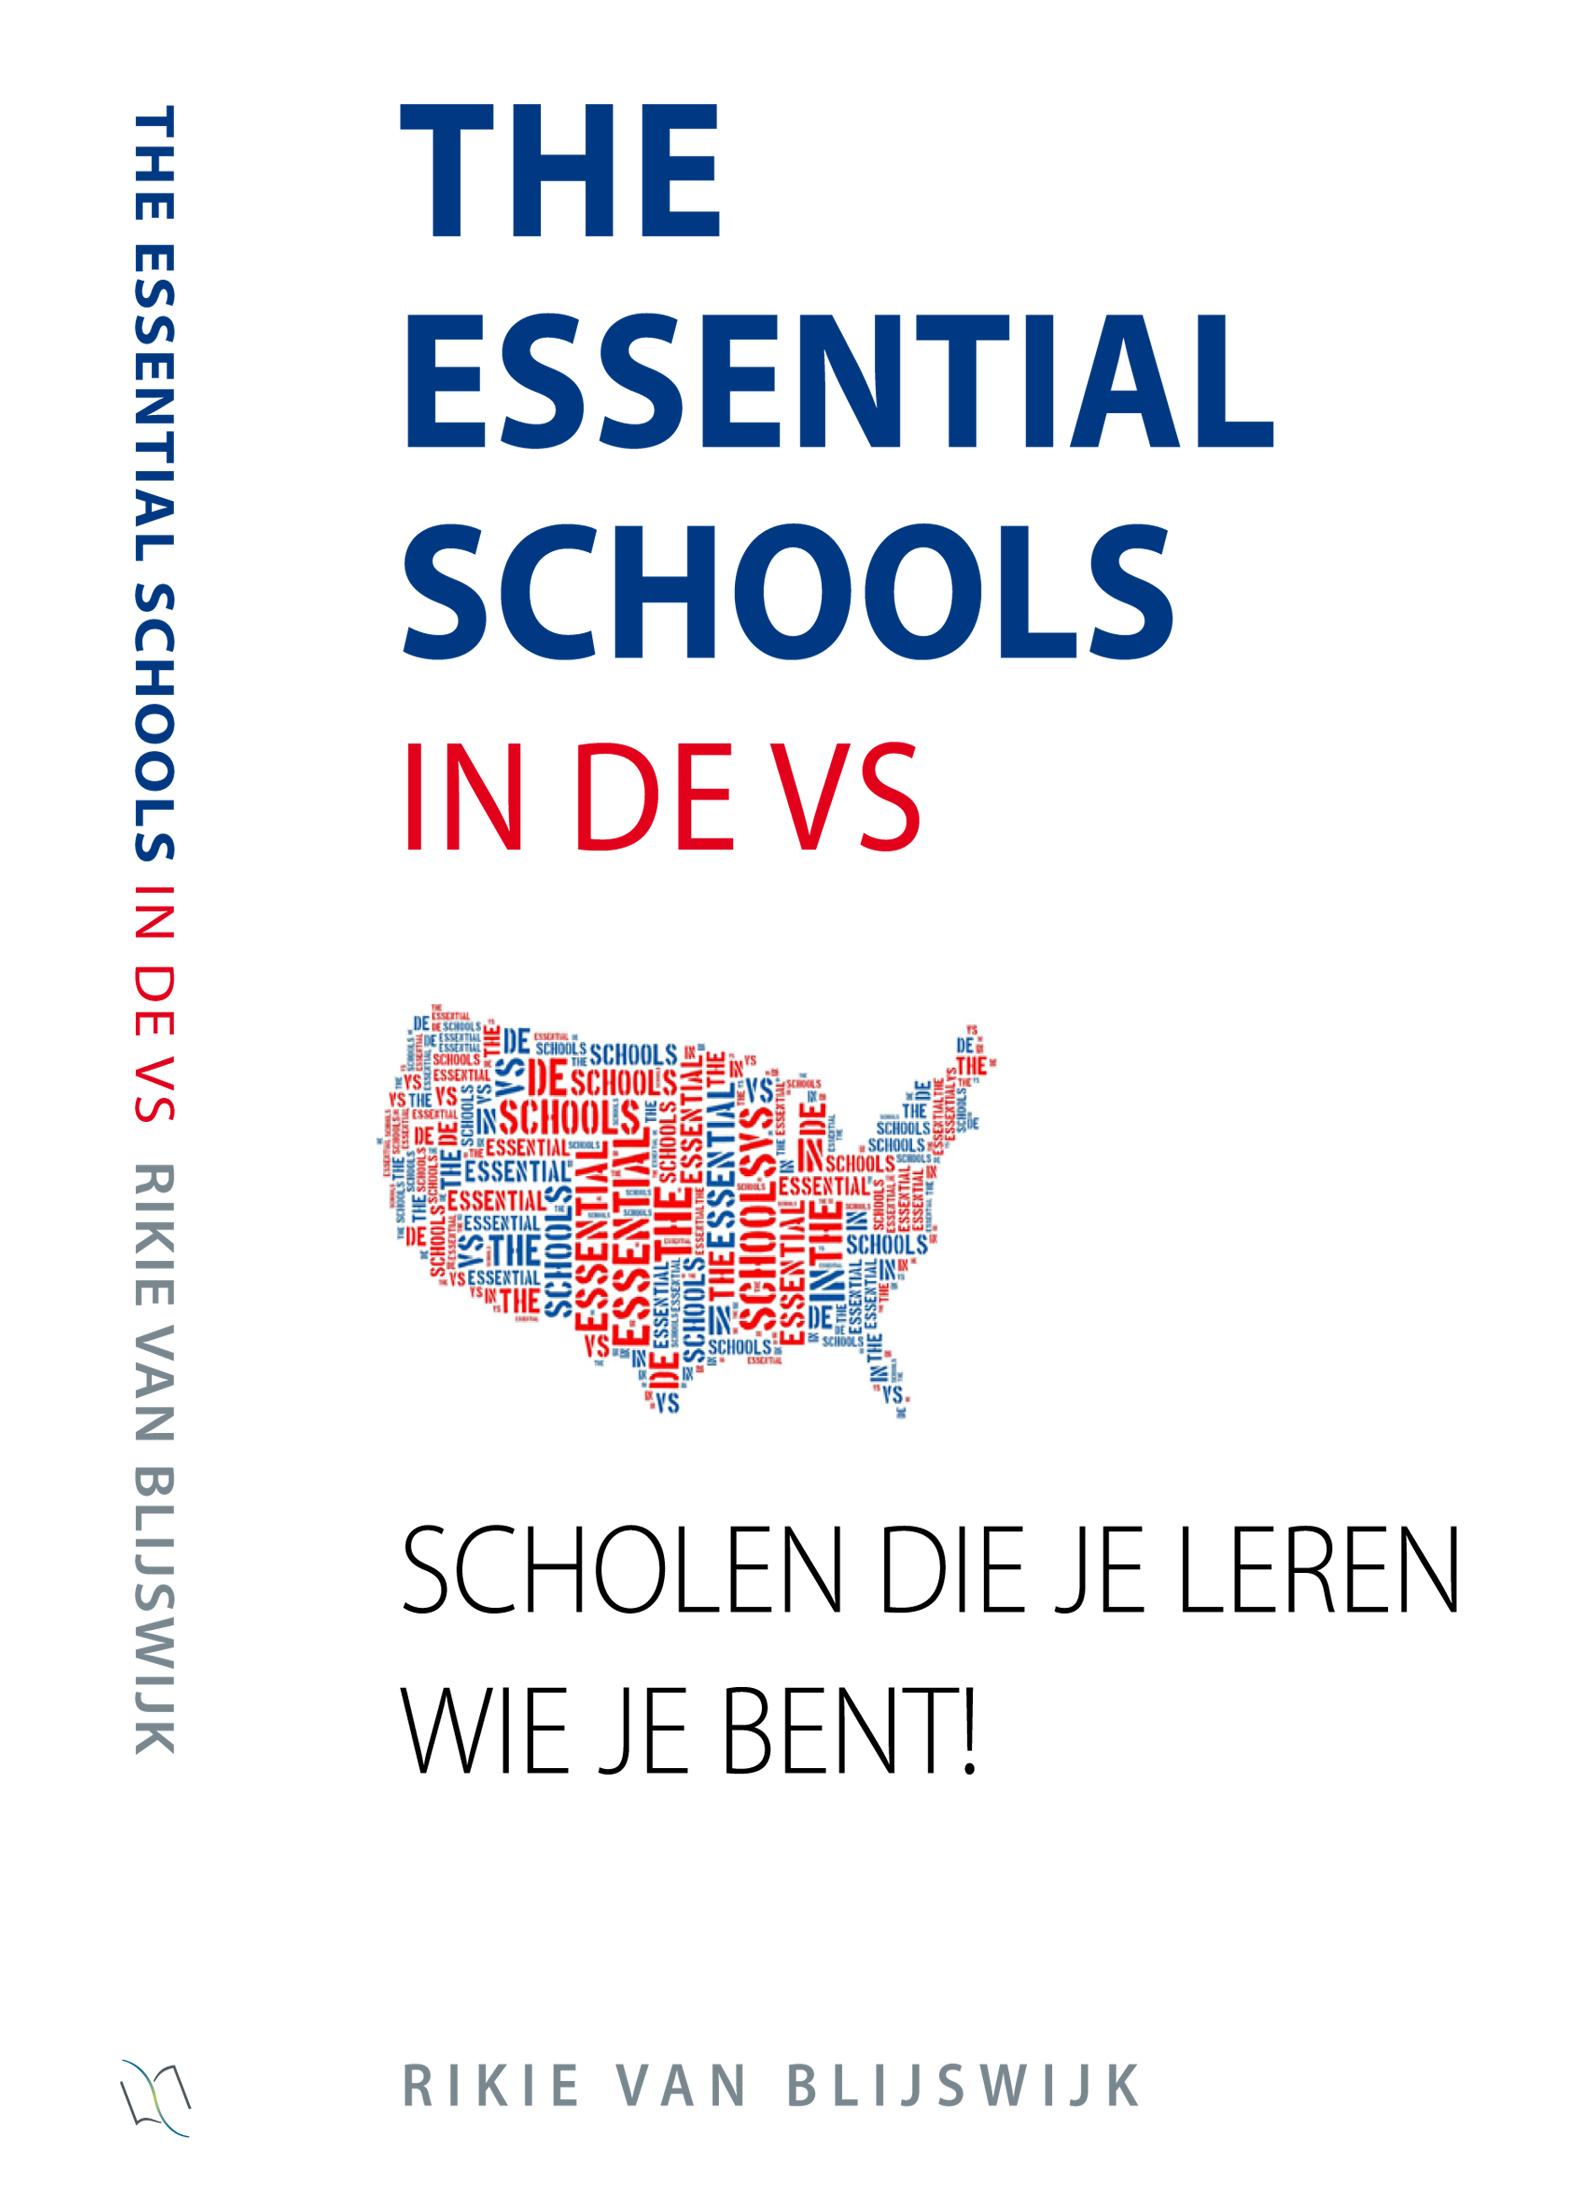 TheEssentialSchool